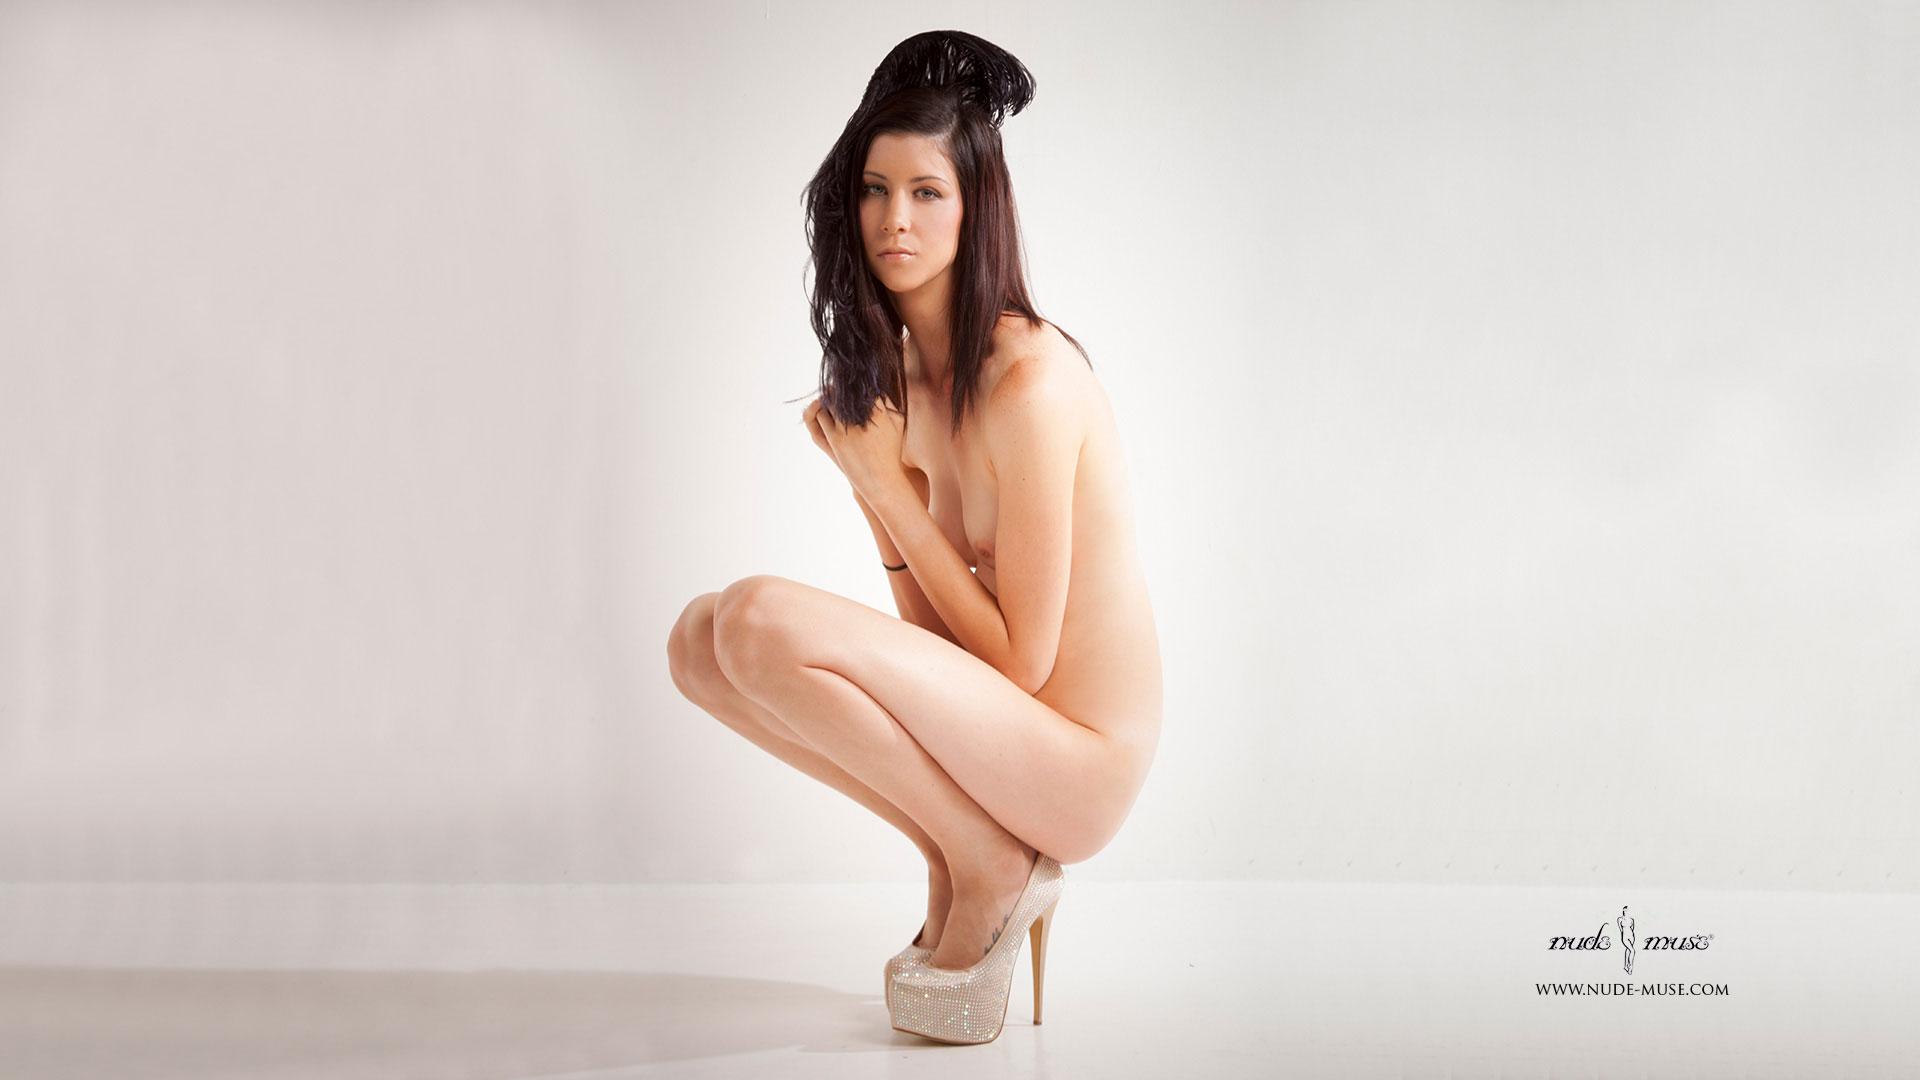 virgin midget free porne